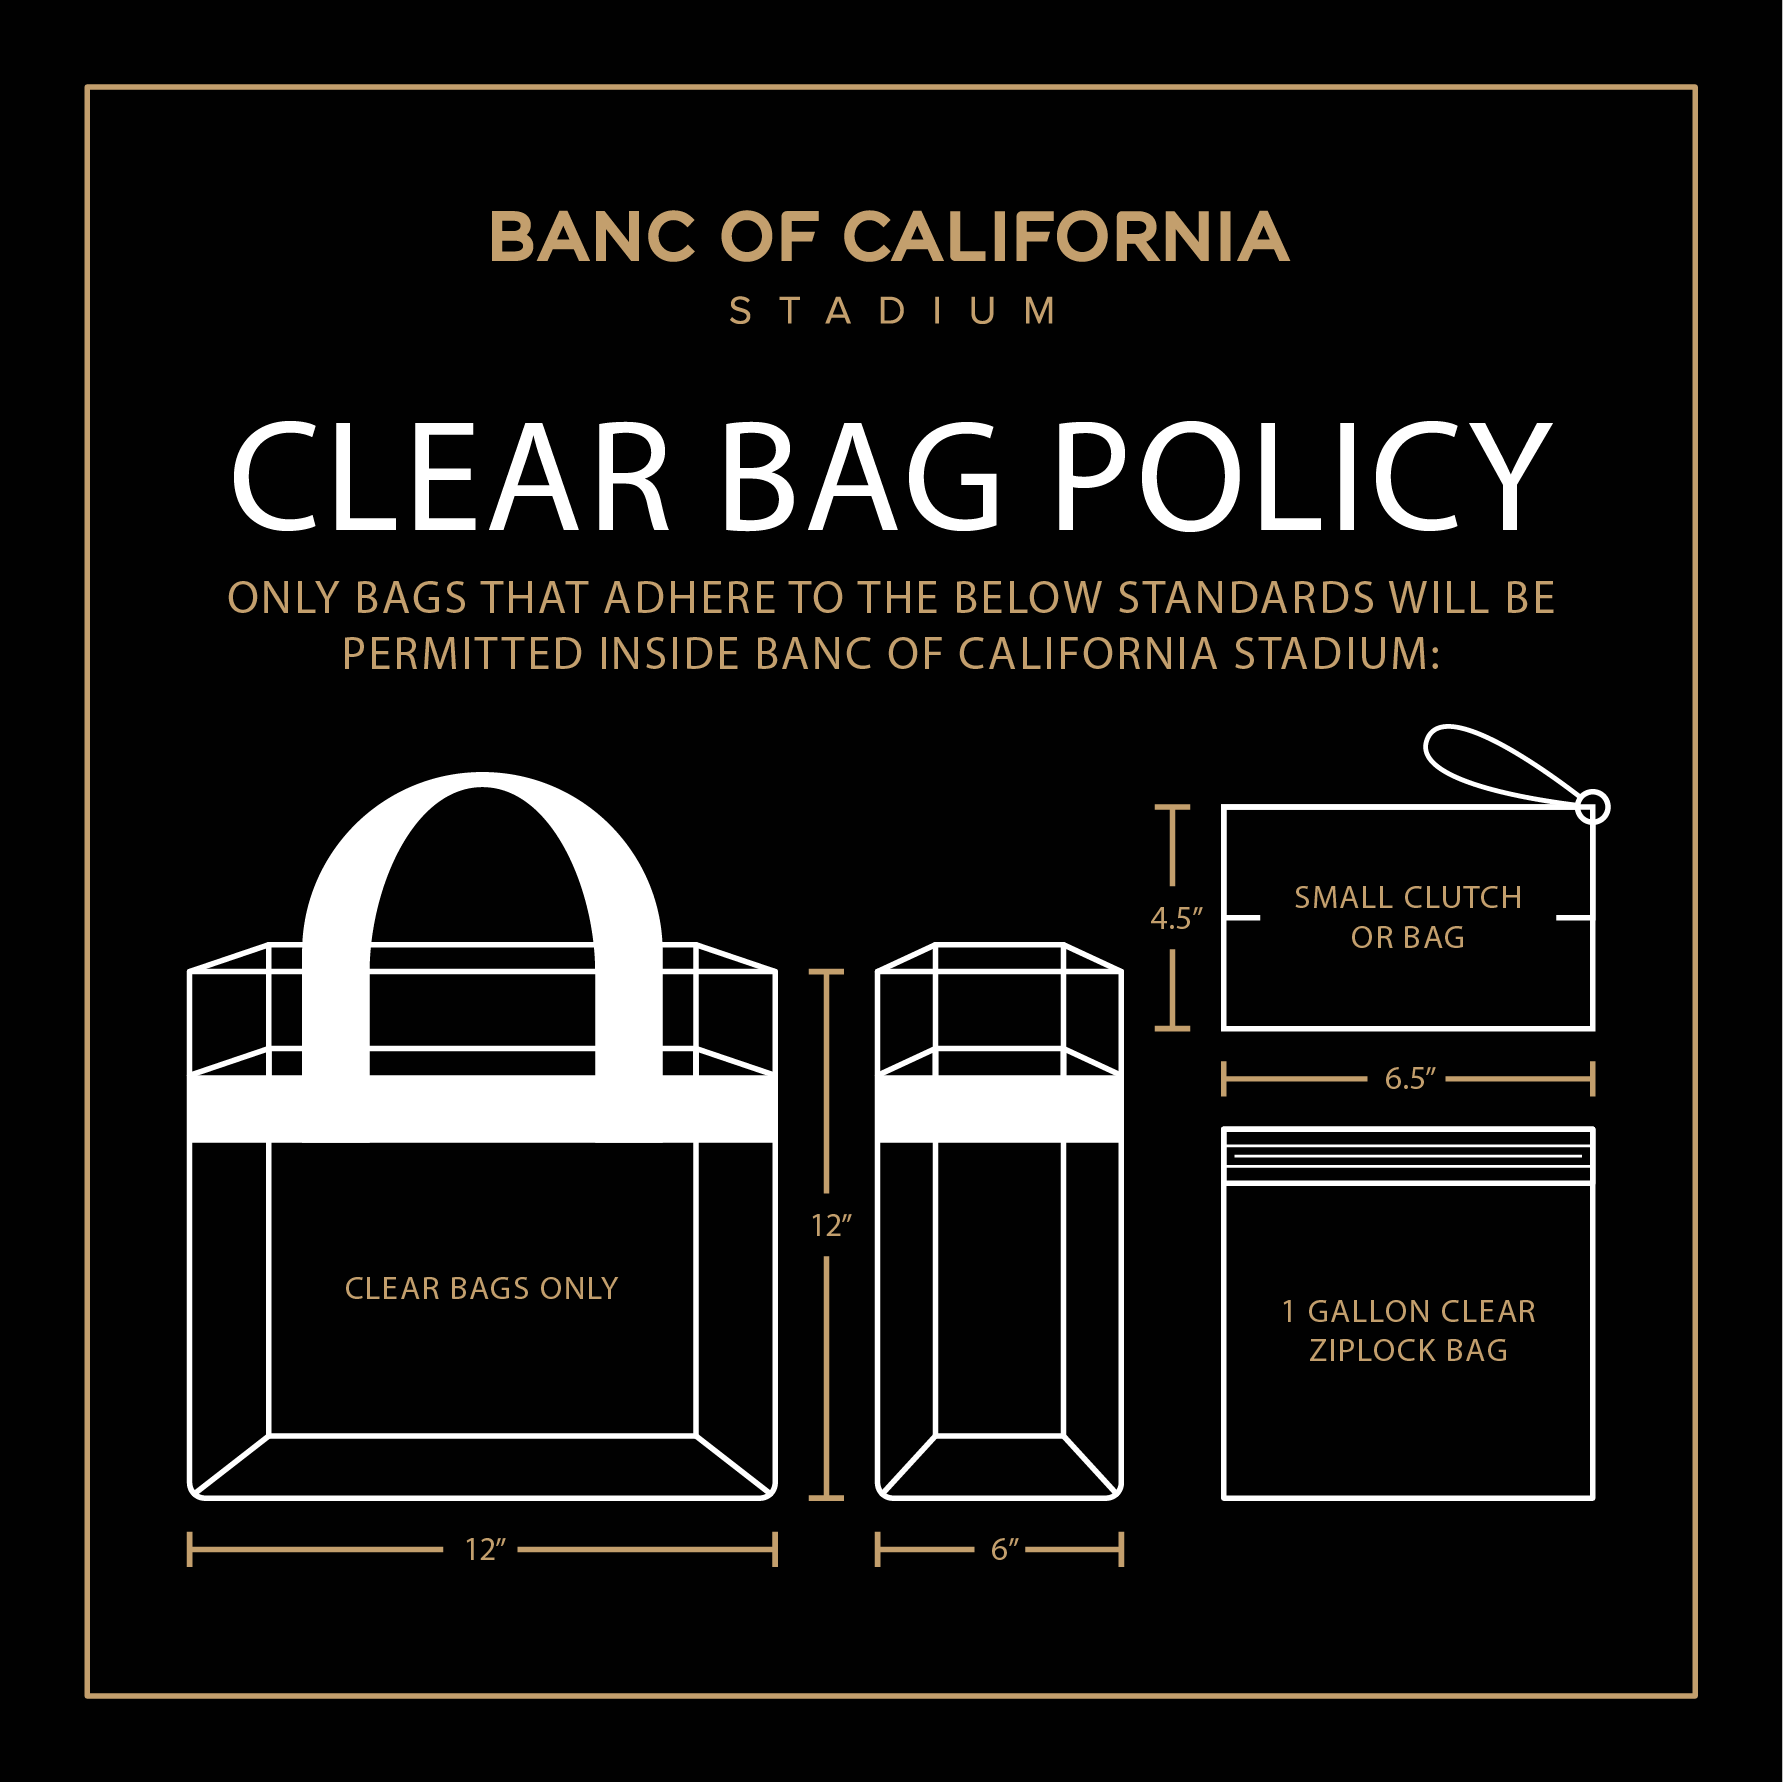 Banc of California Stadium Clear Bag Policy